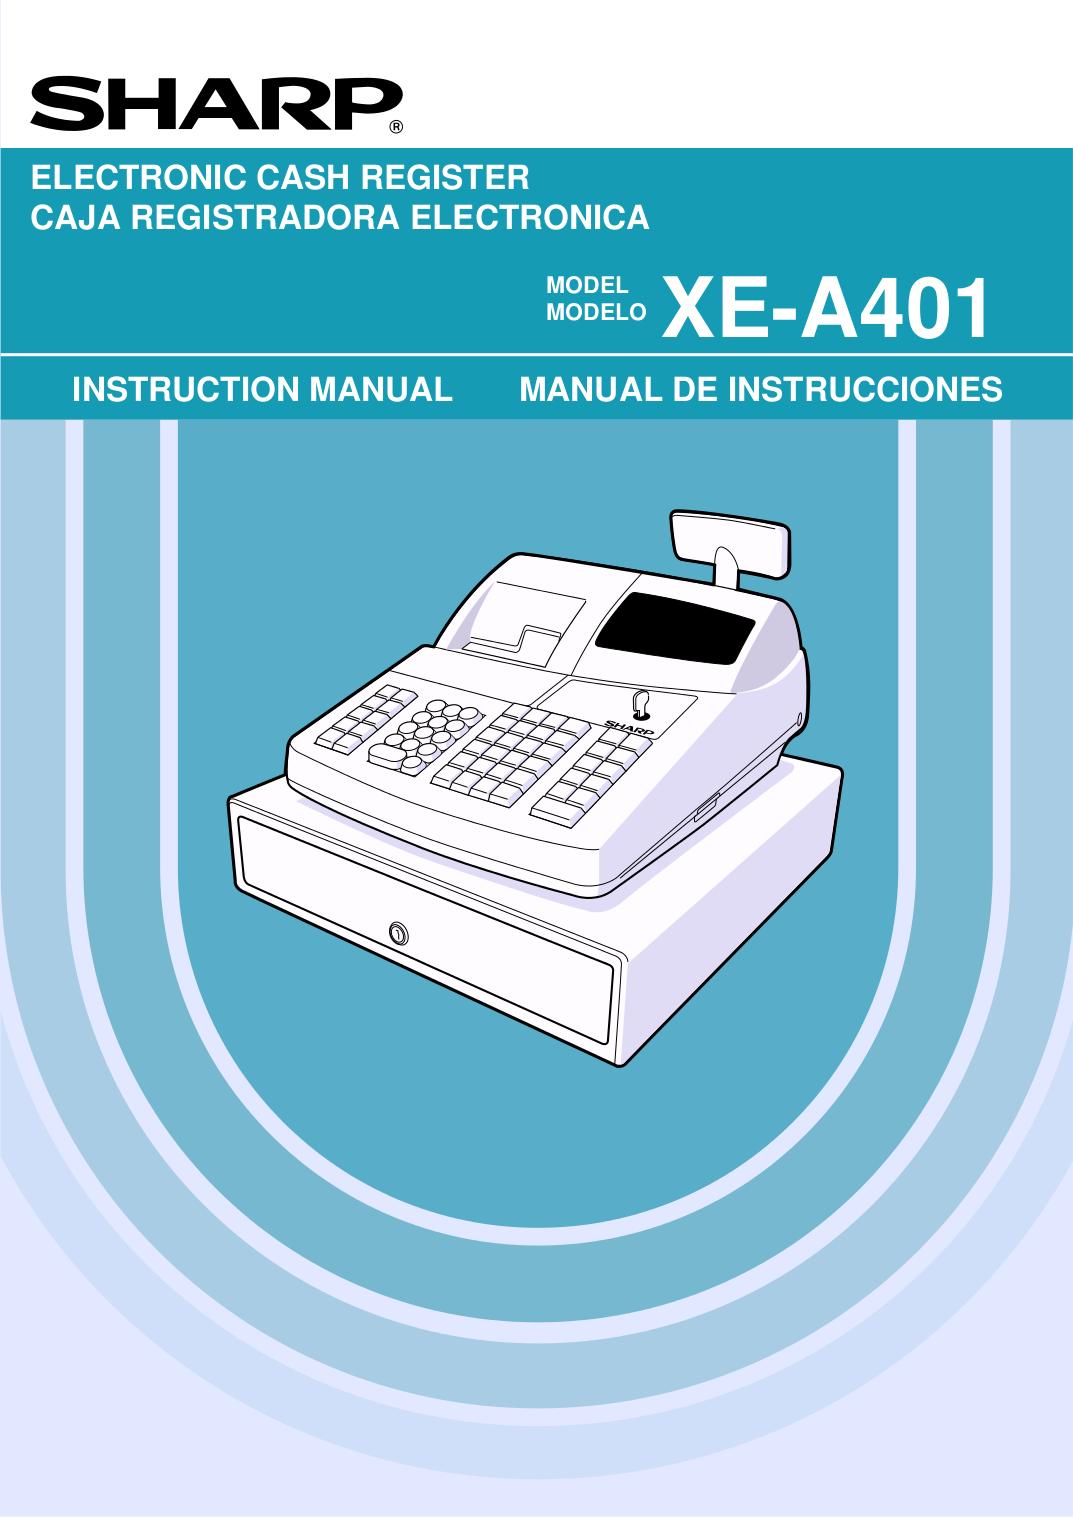 Cashregisterstore. Com > sharp xe-a505 > user (programming) manual.